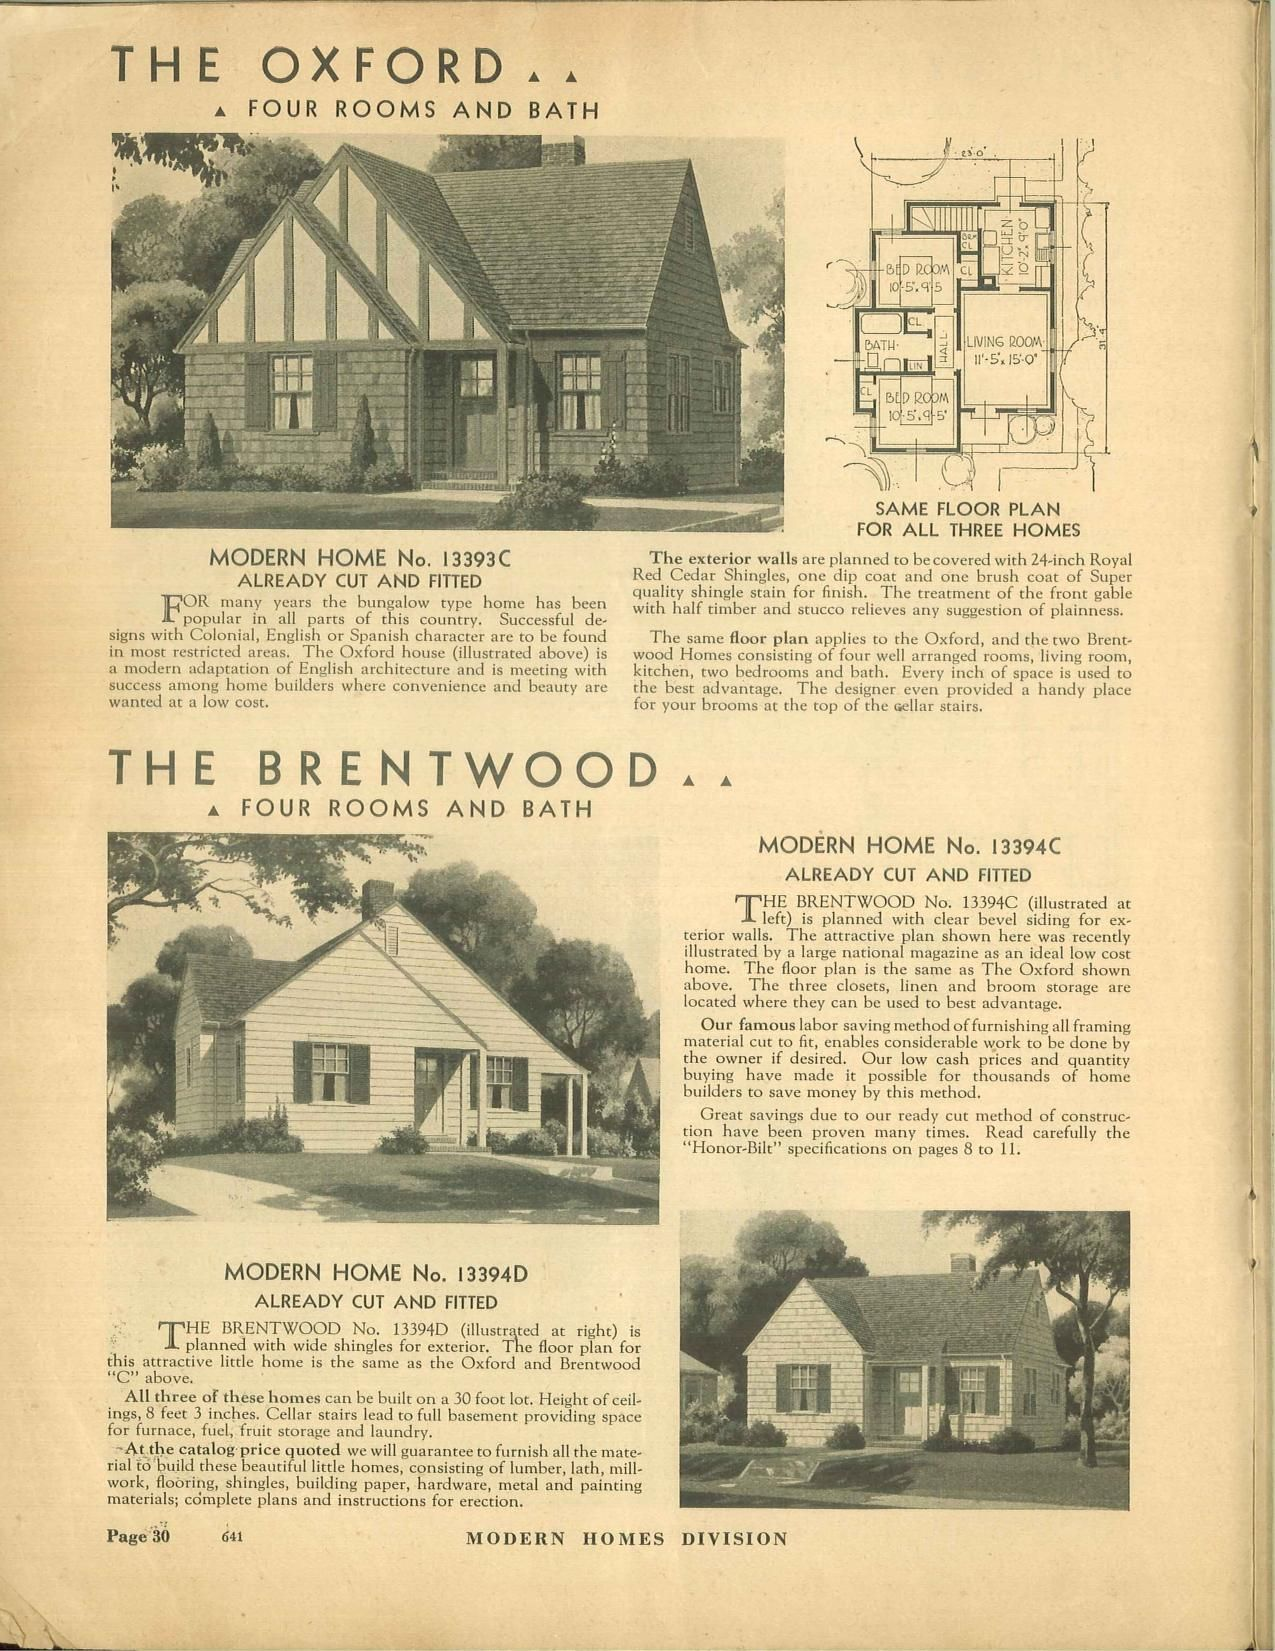 Sears Oxford Brentwood   Oxford 1933 13393A 13393B   1934 13393C. Sears Oxford Brentwood   Oxford 1933 13393A 13393B   1934 13393C